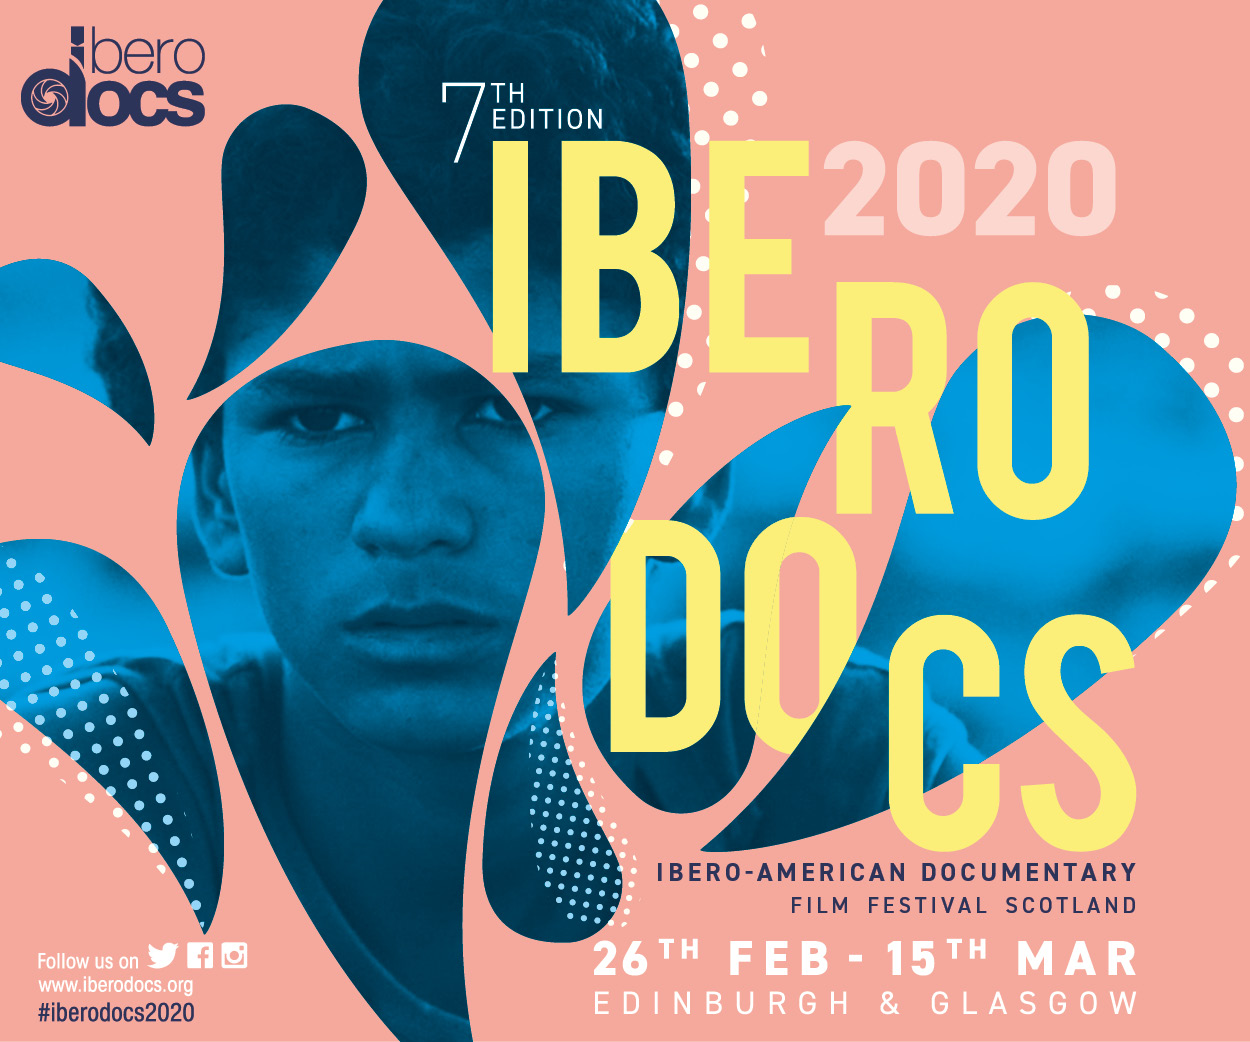 Iberodocs 2020